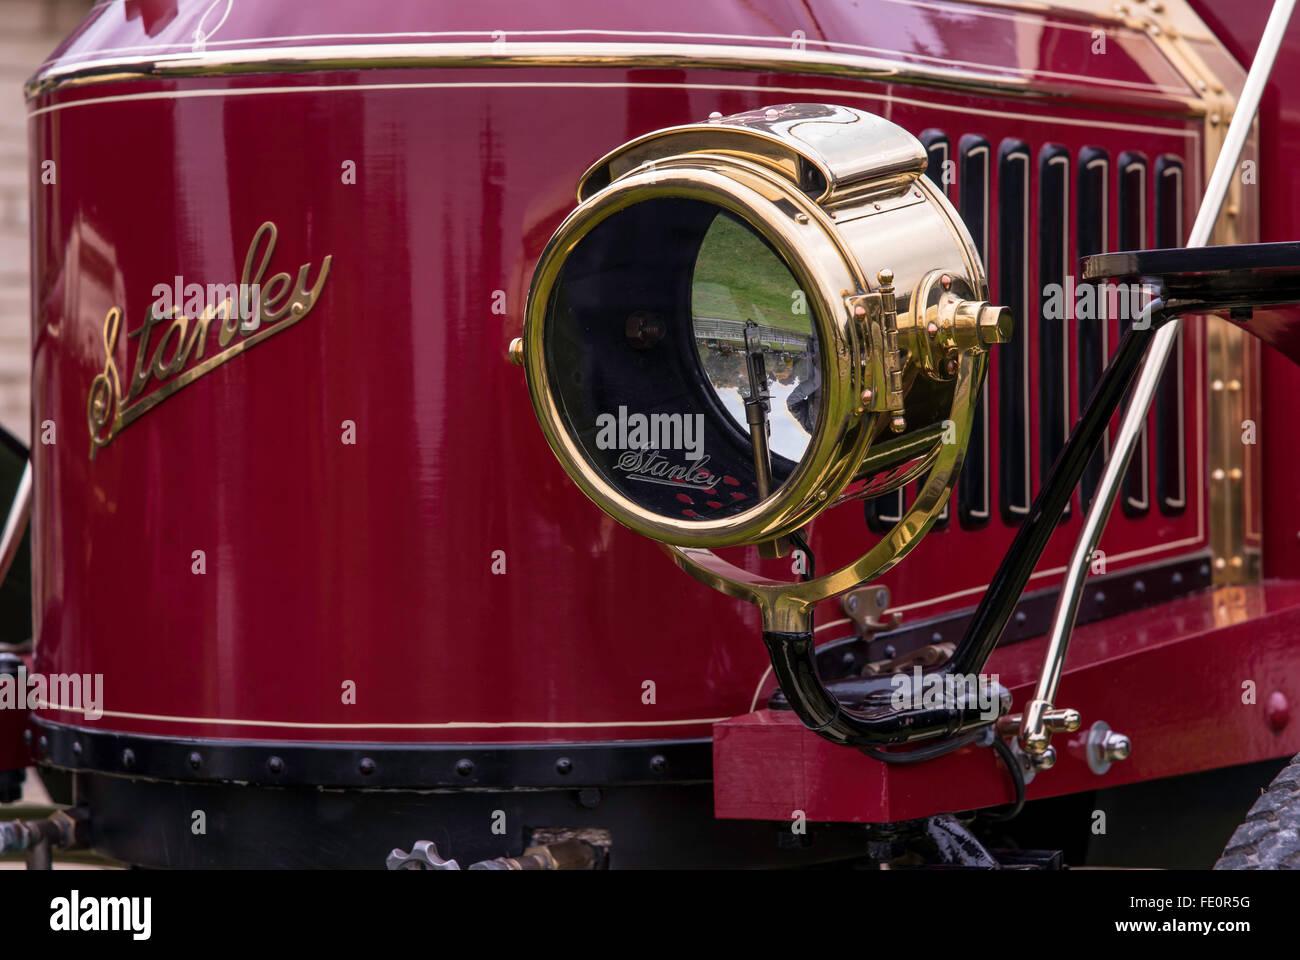 Detail of Stanley Steamer Vintage motor car - Stock Image